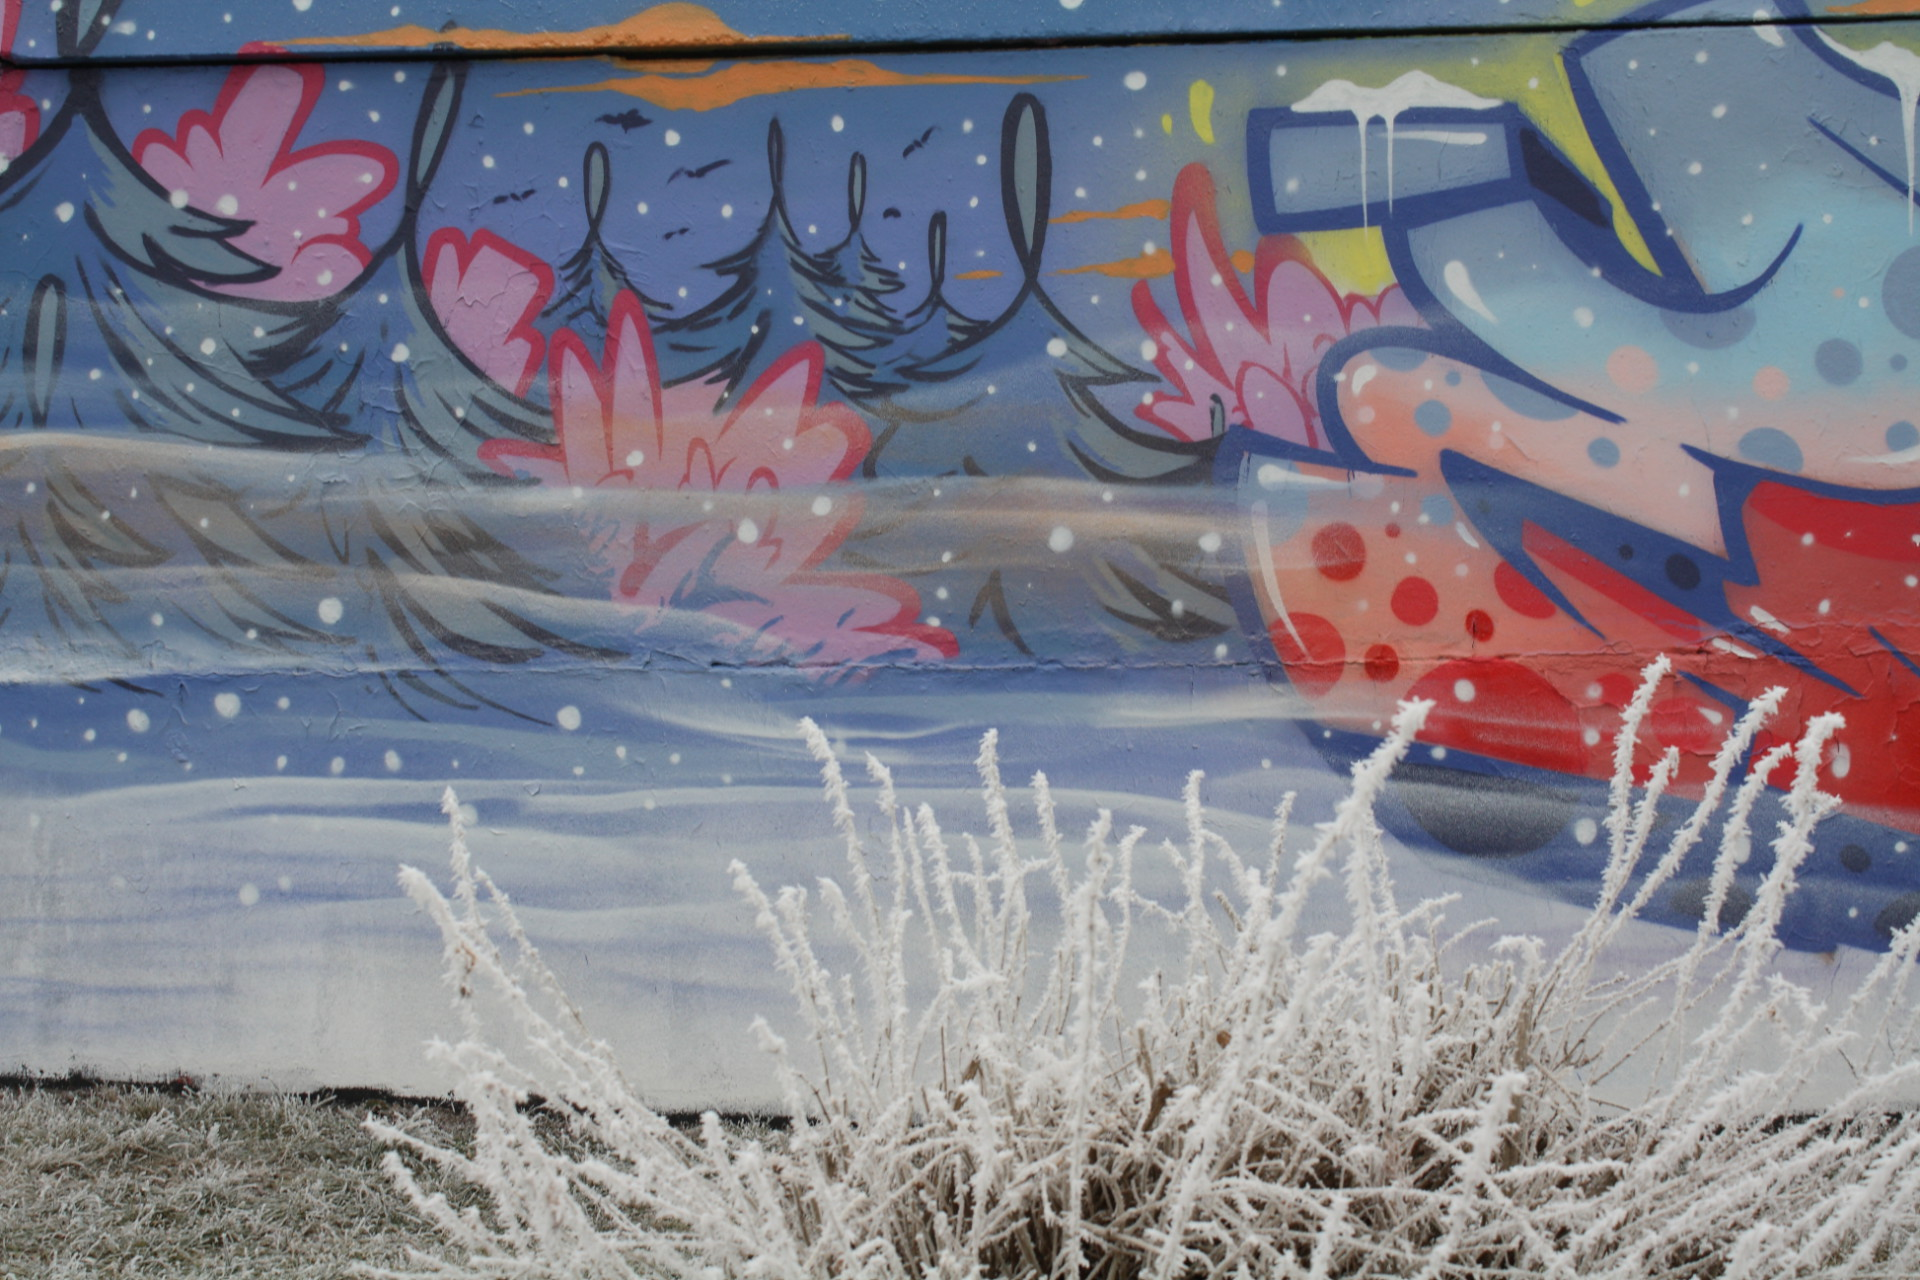 129-Sprayers Winterwunderland_MG_7784v